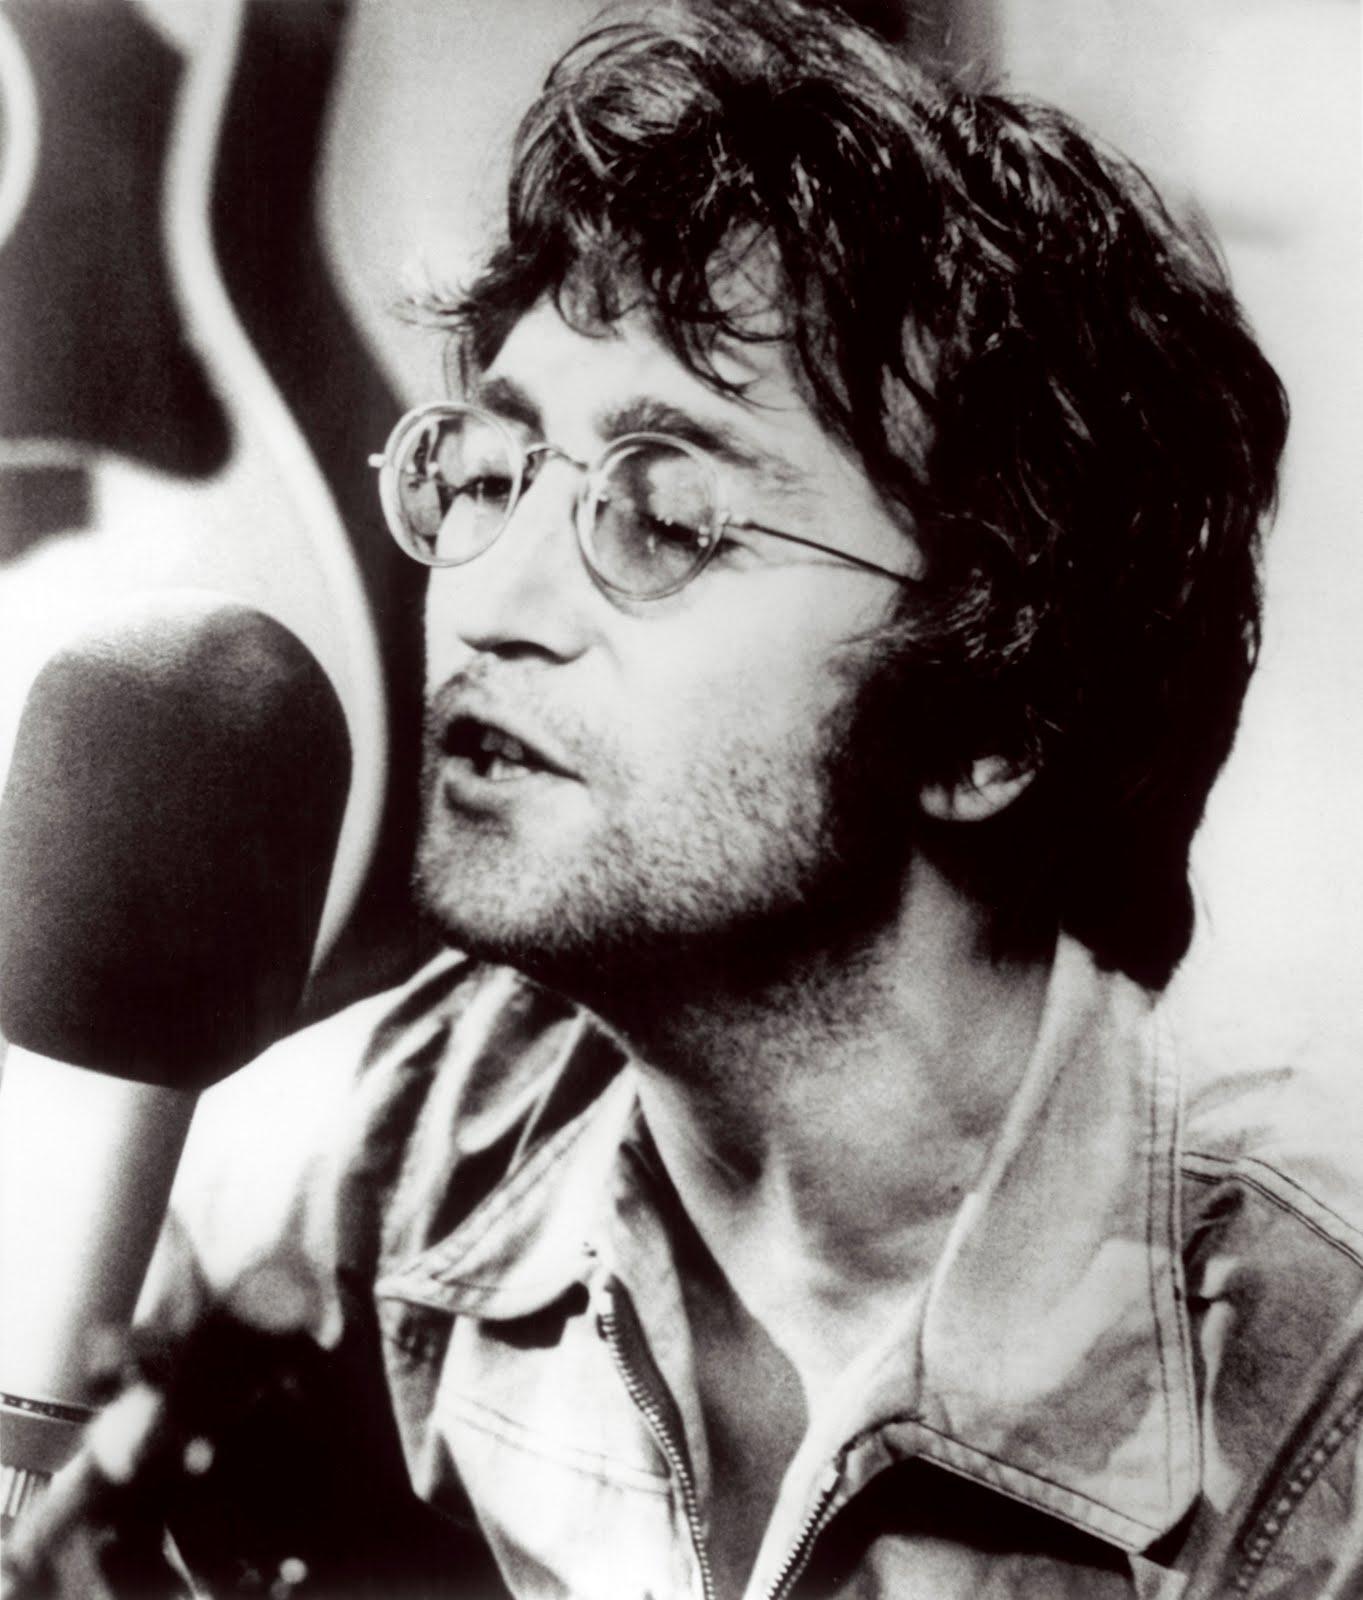 http://4.bp.blogspot.com/_E9NPoeLuzC4/TLDFyxmOCFI/AAAAAAAACpE/E2IEiLQ28Ng/s1600/John_Lennon_2-1.jpg